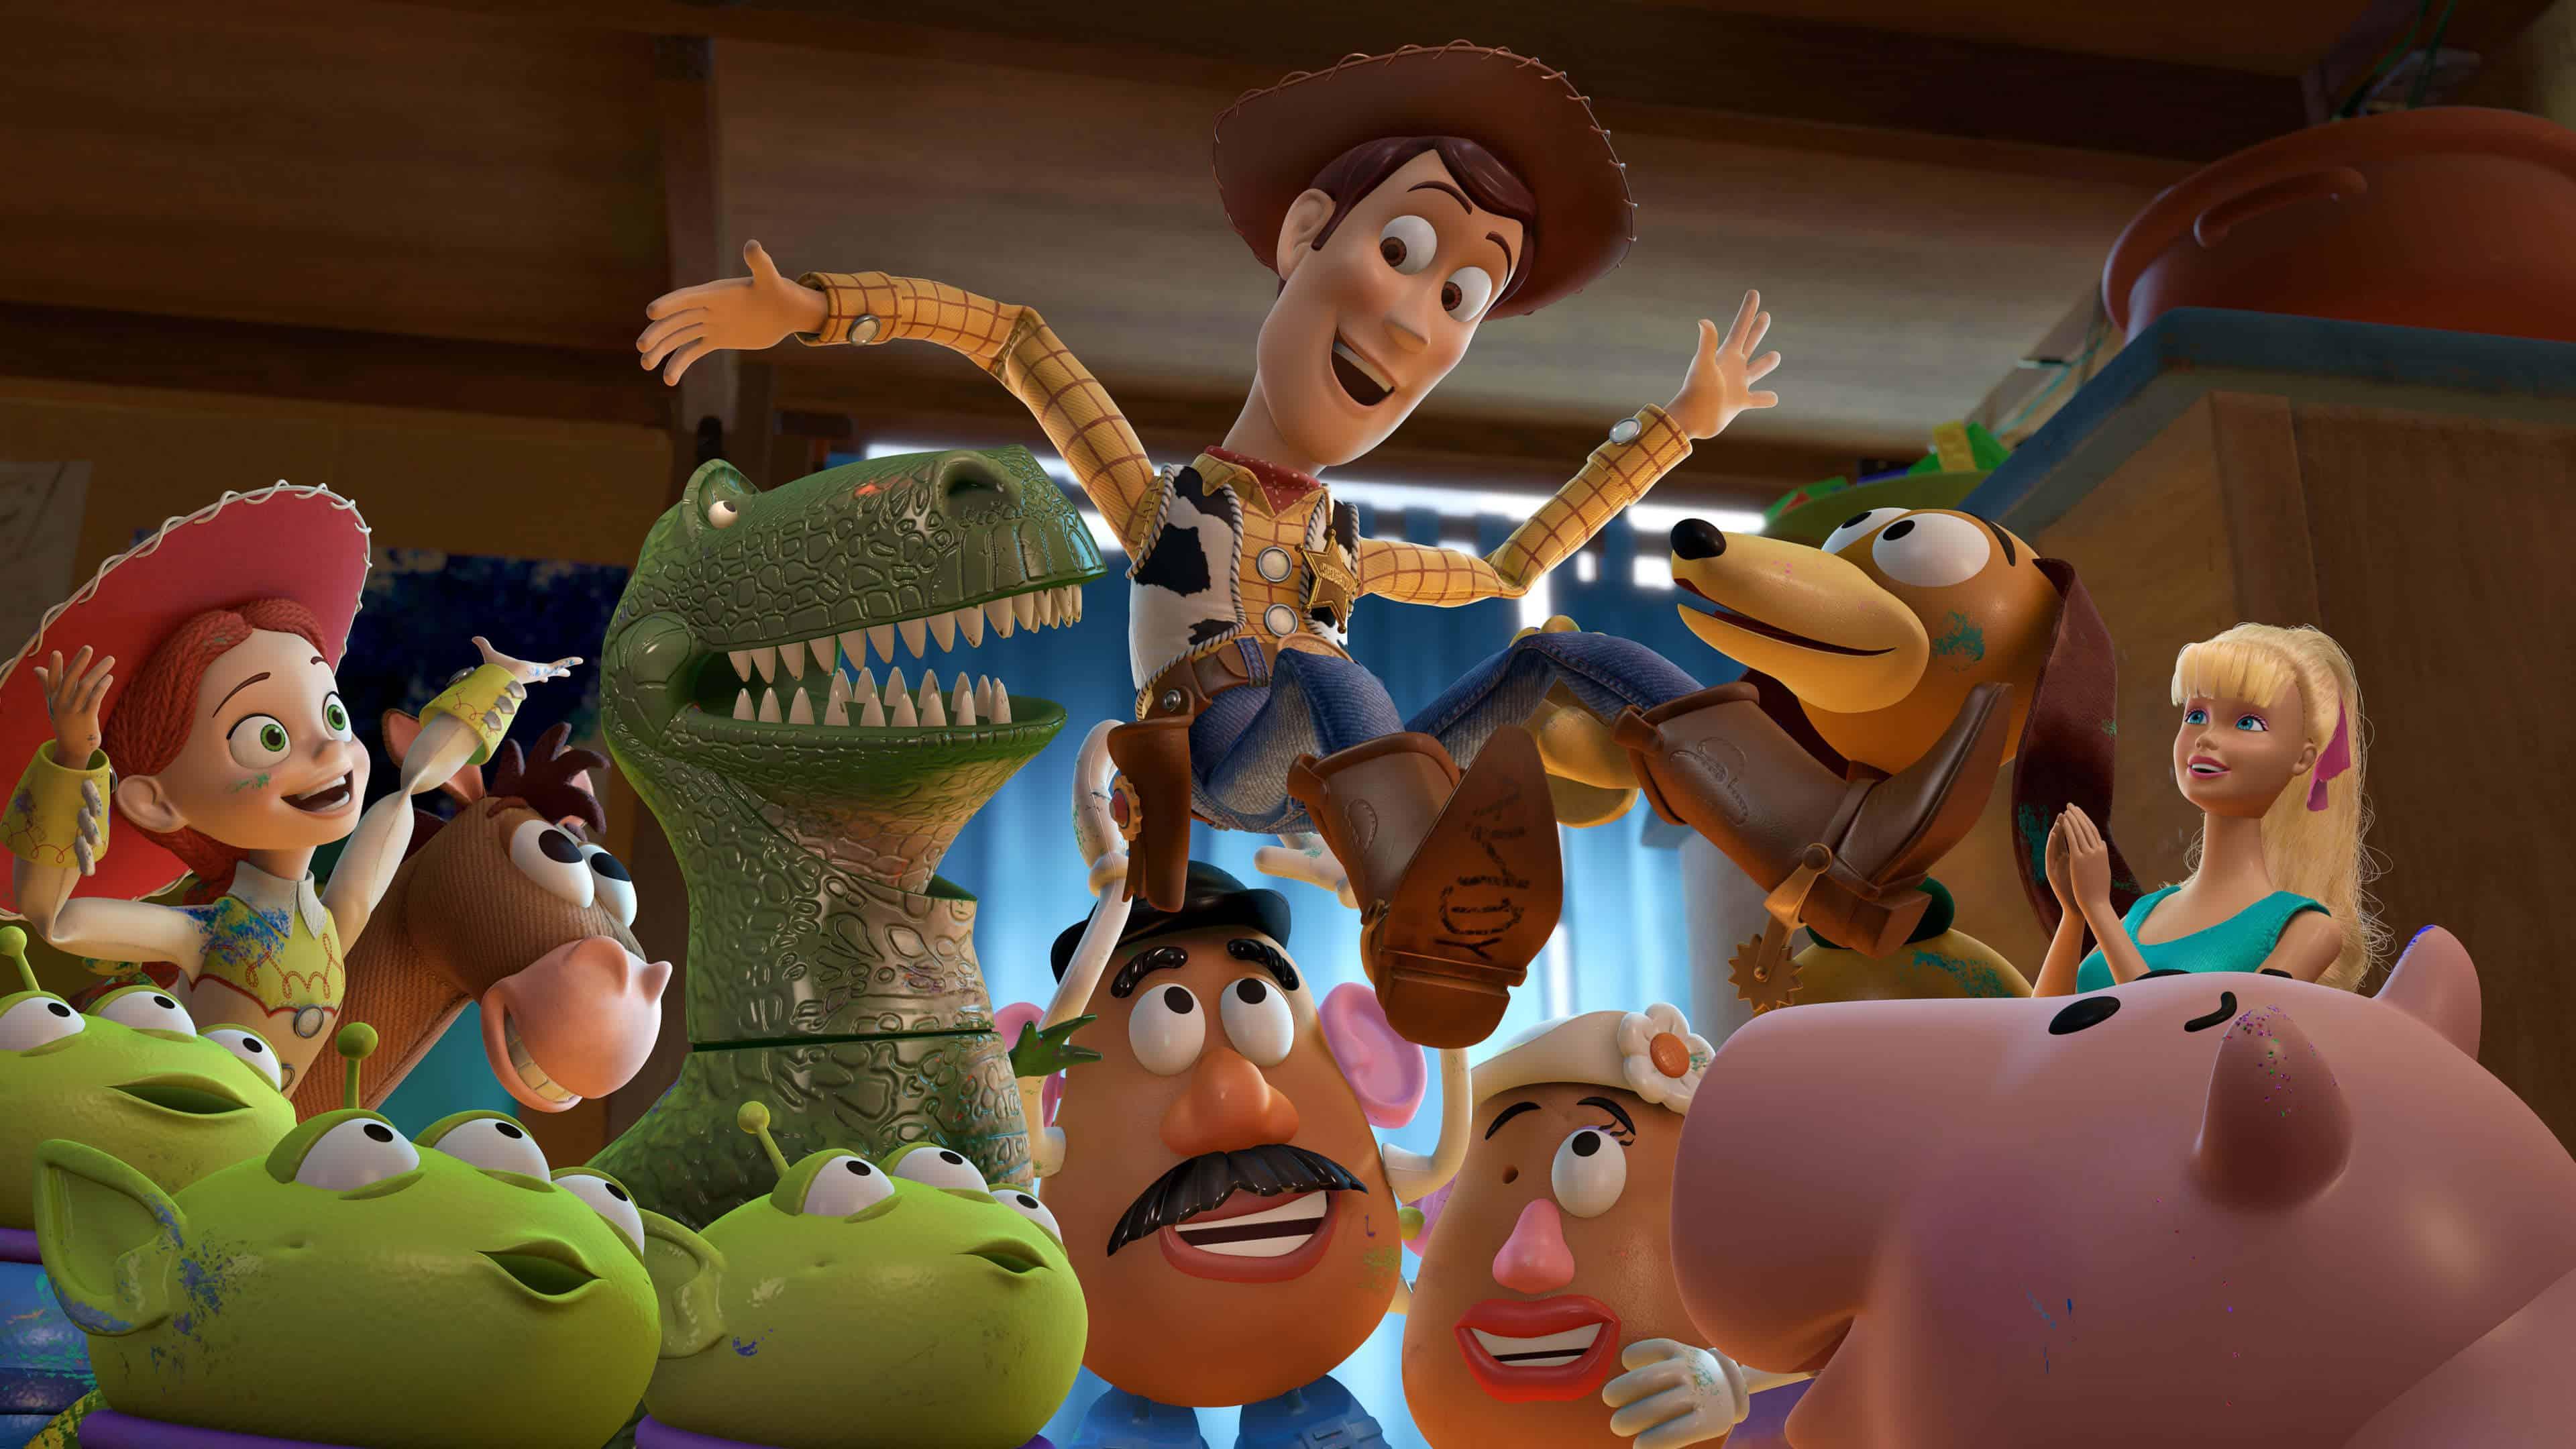 Toy Story 3 UHD 4K Wallpaper Pixelz 3840x2160